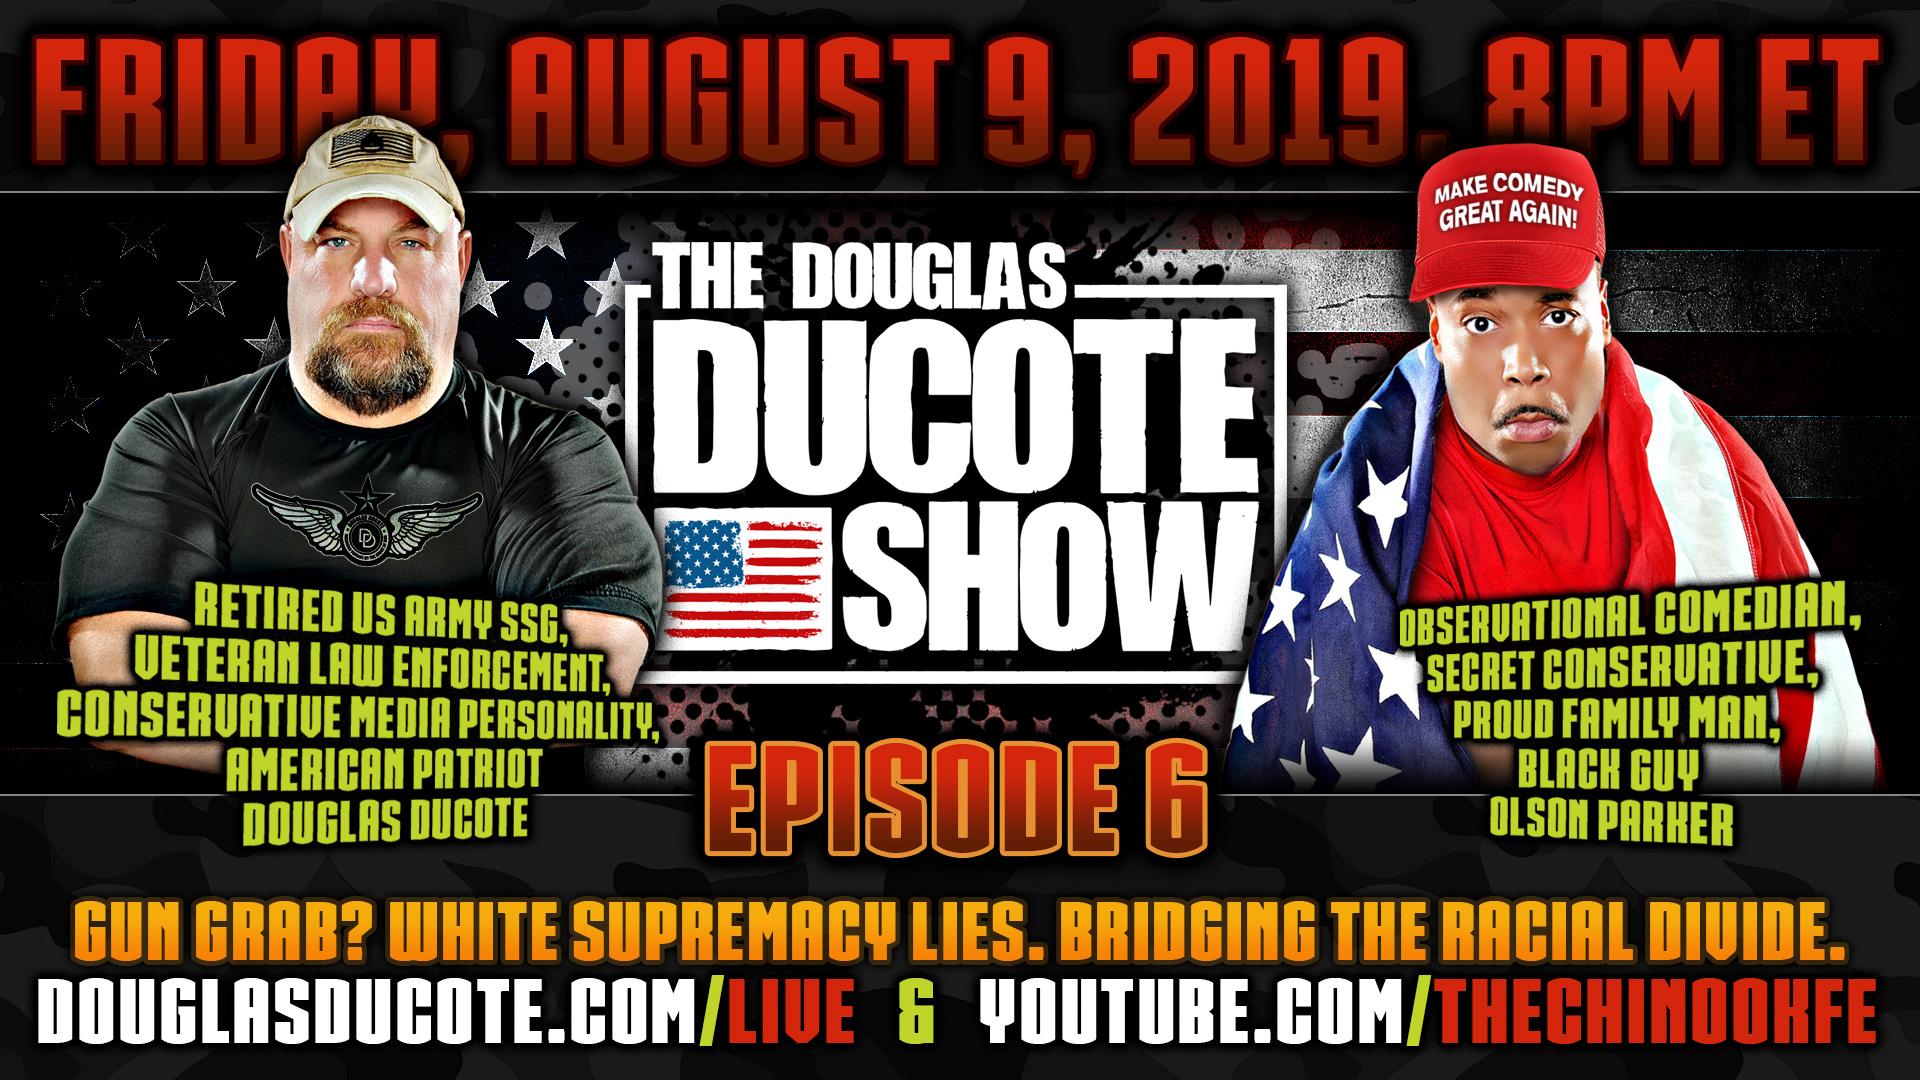 The-Douglas-Ducote-Show-Episode-6-1